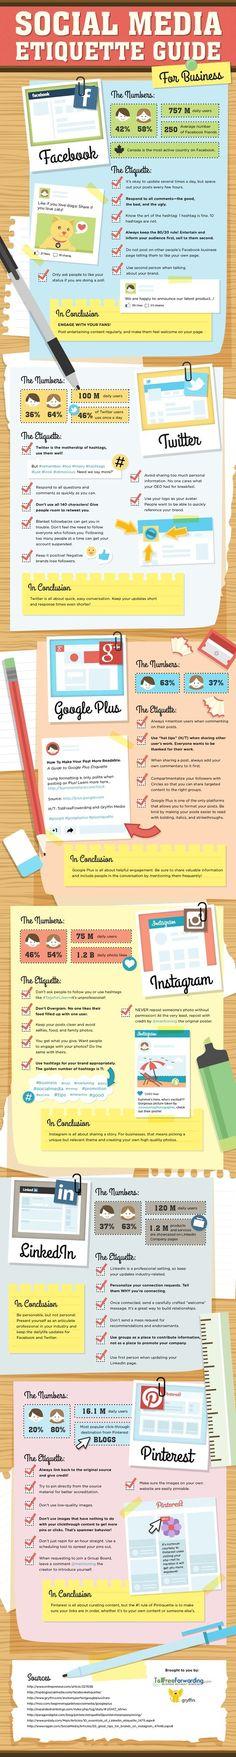 GooglePlus, Twitter, Instagram, Facebook, Pinterest - Social Media Etiquette Guide For Business - #infographic   Time to Learn   Scoop.it